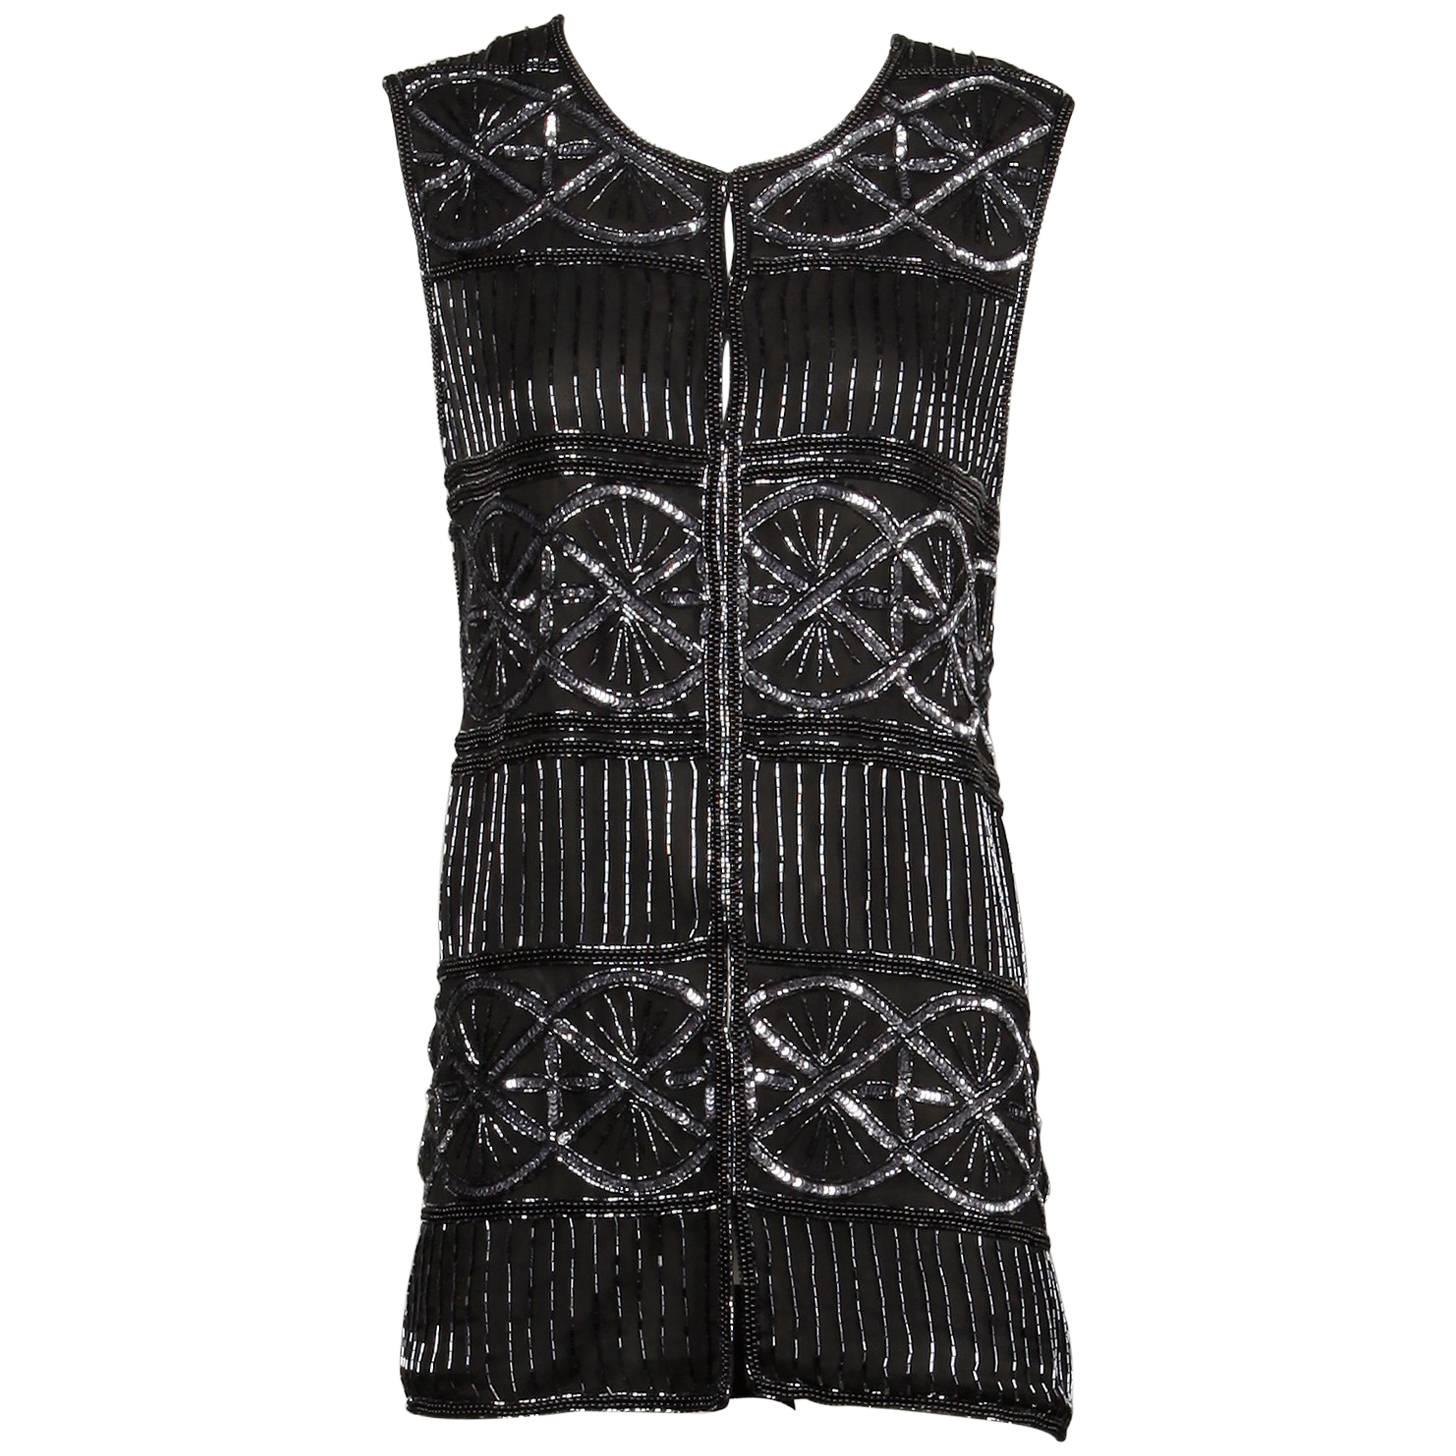 Mary Mcfadden Vintage Black Silk Metallic Beaded + Sequin Vest Jacket / Tank Top